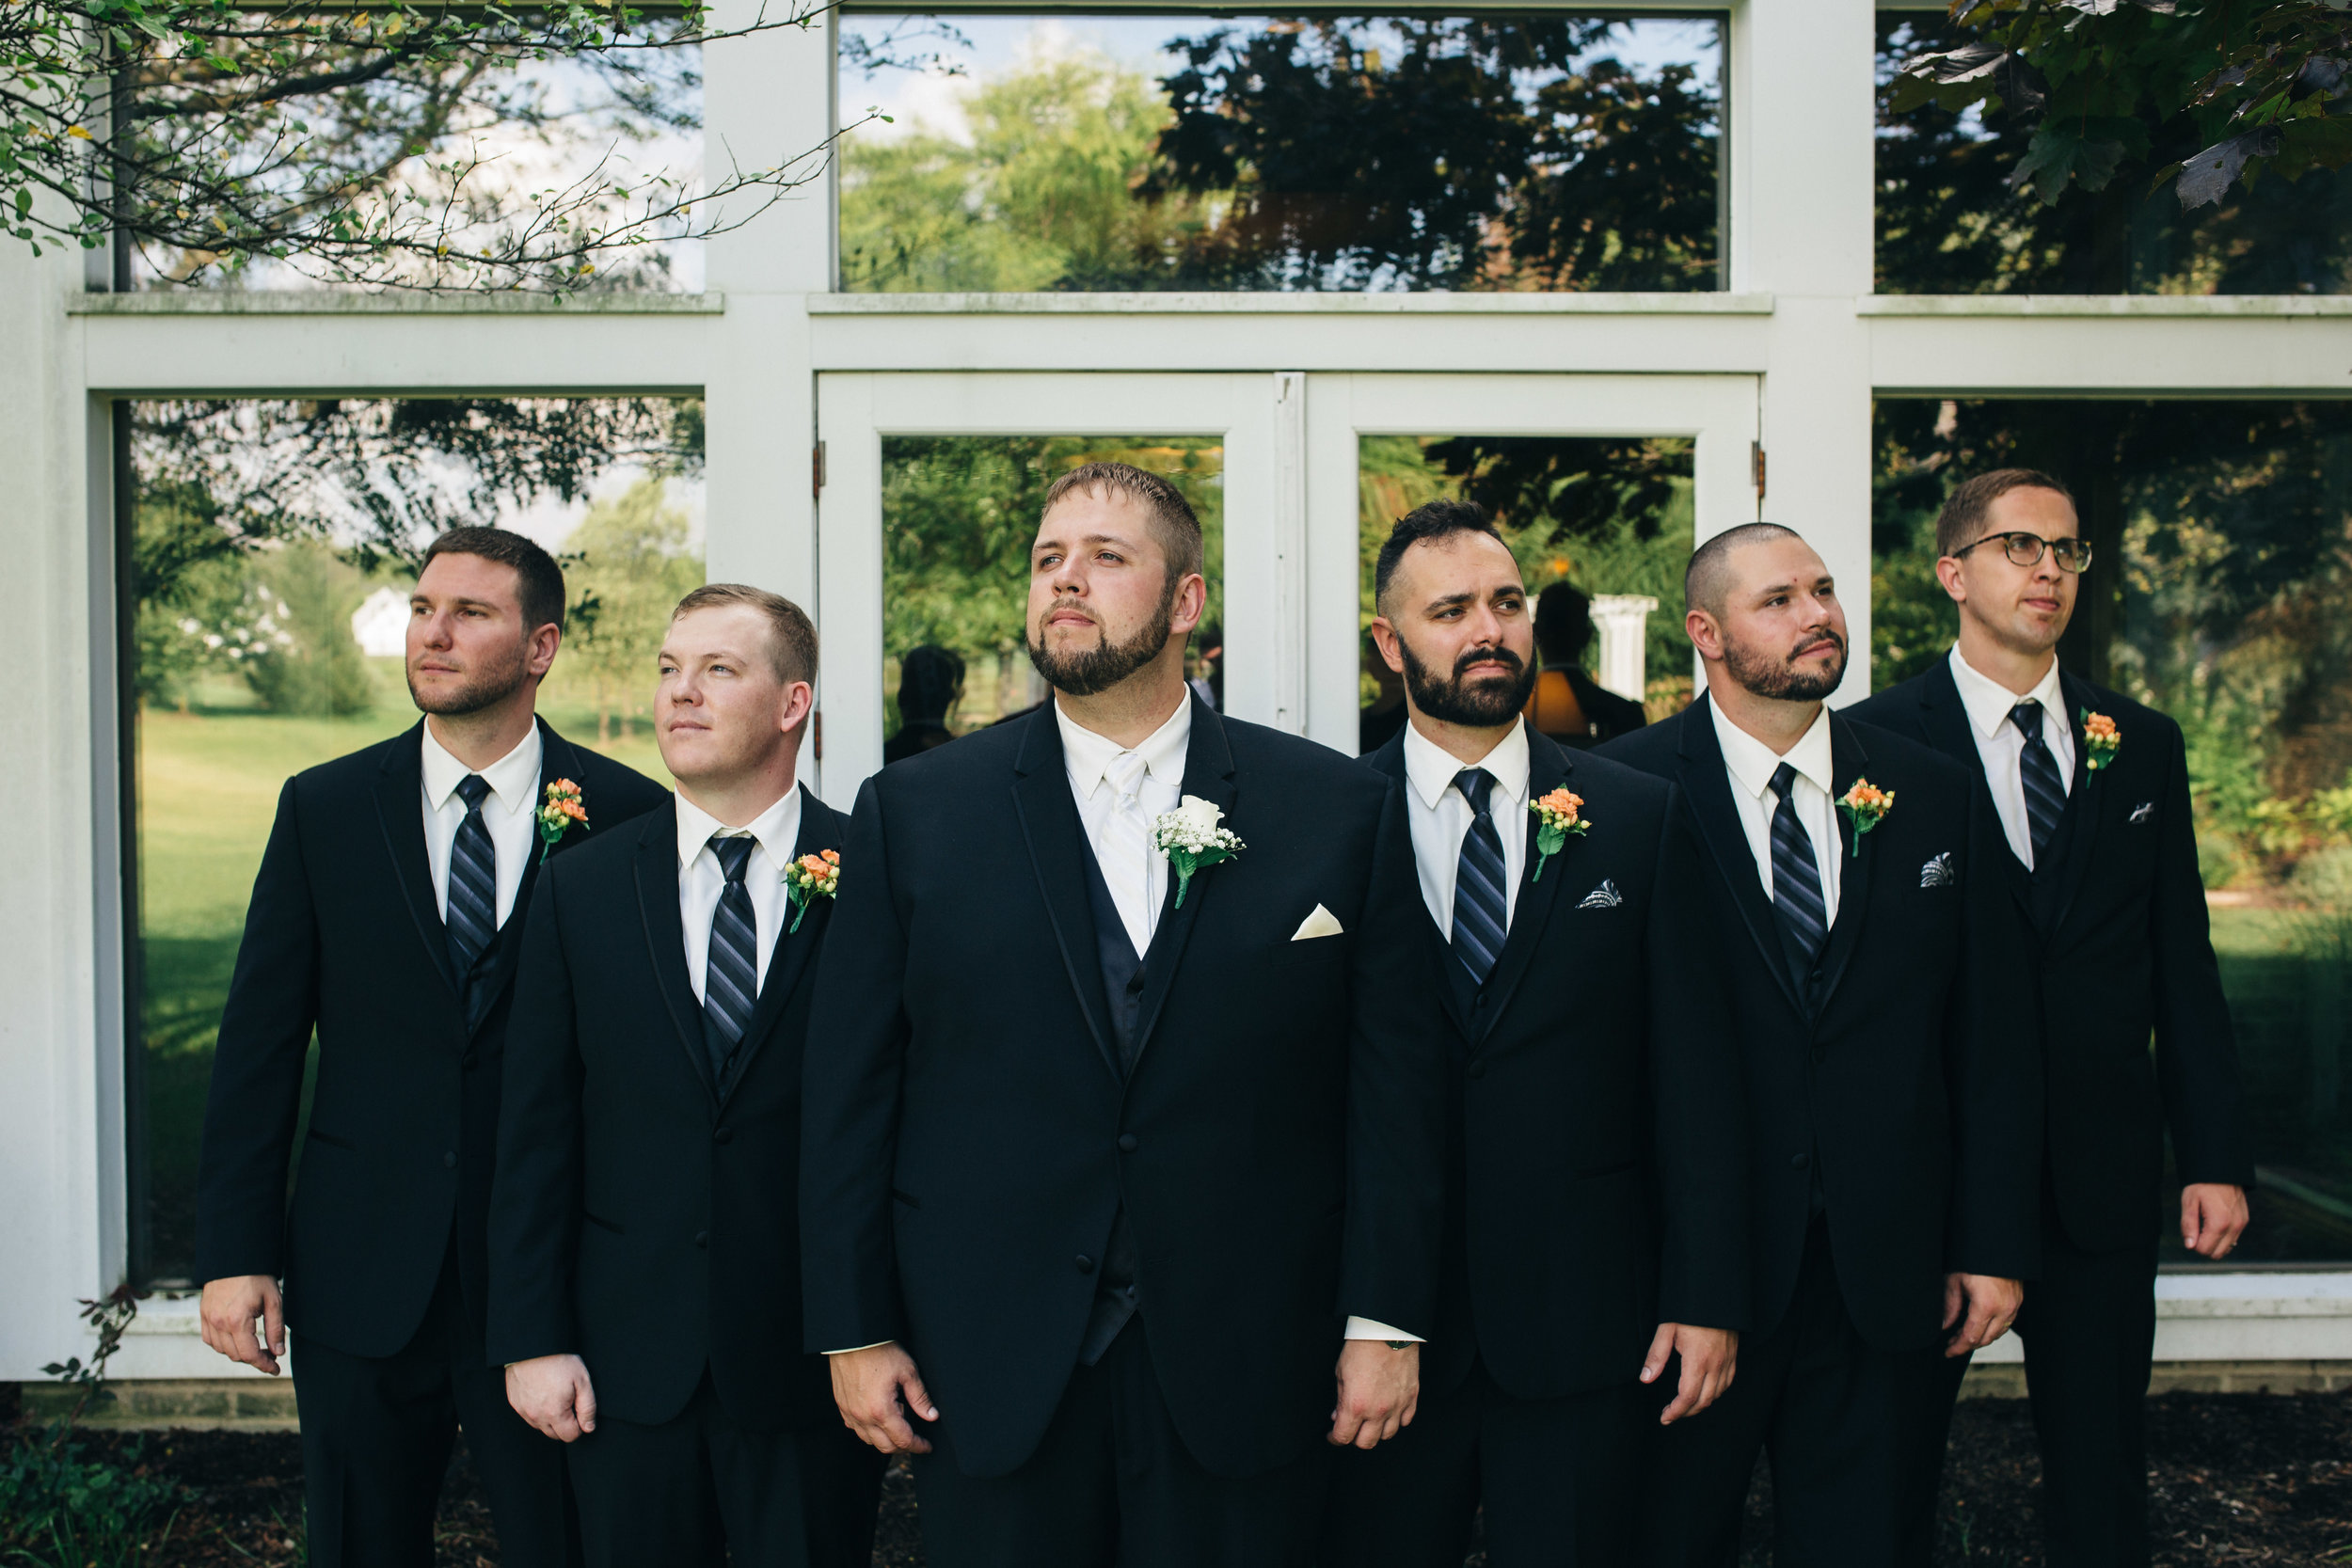 Groomsmen wedding photography at Walden Inn.